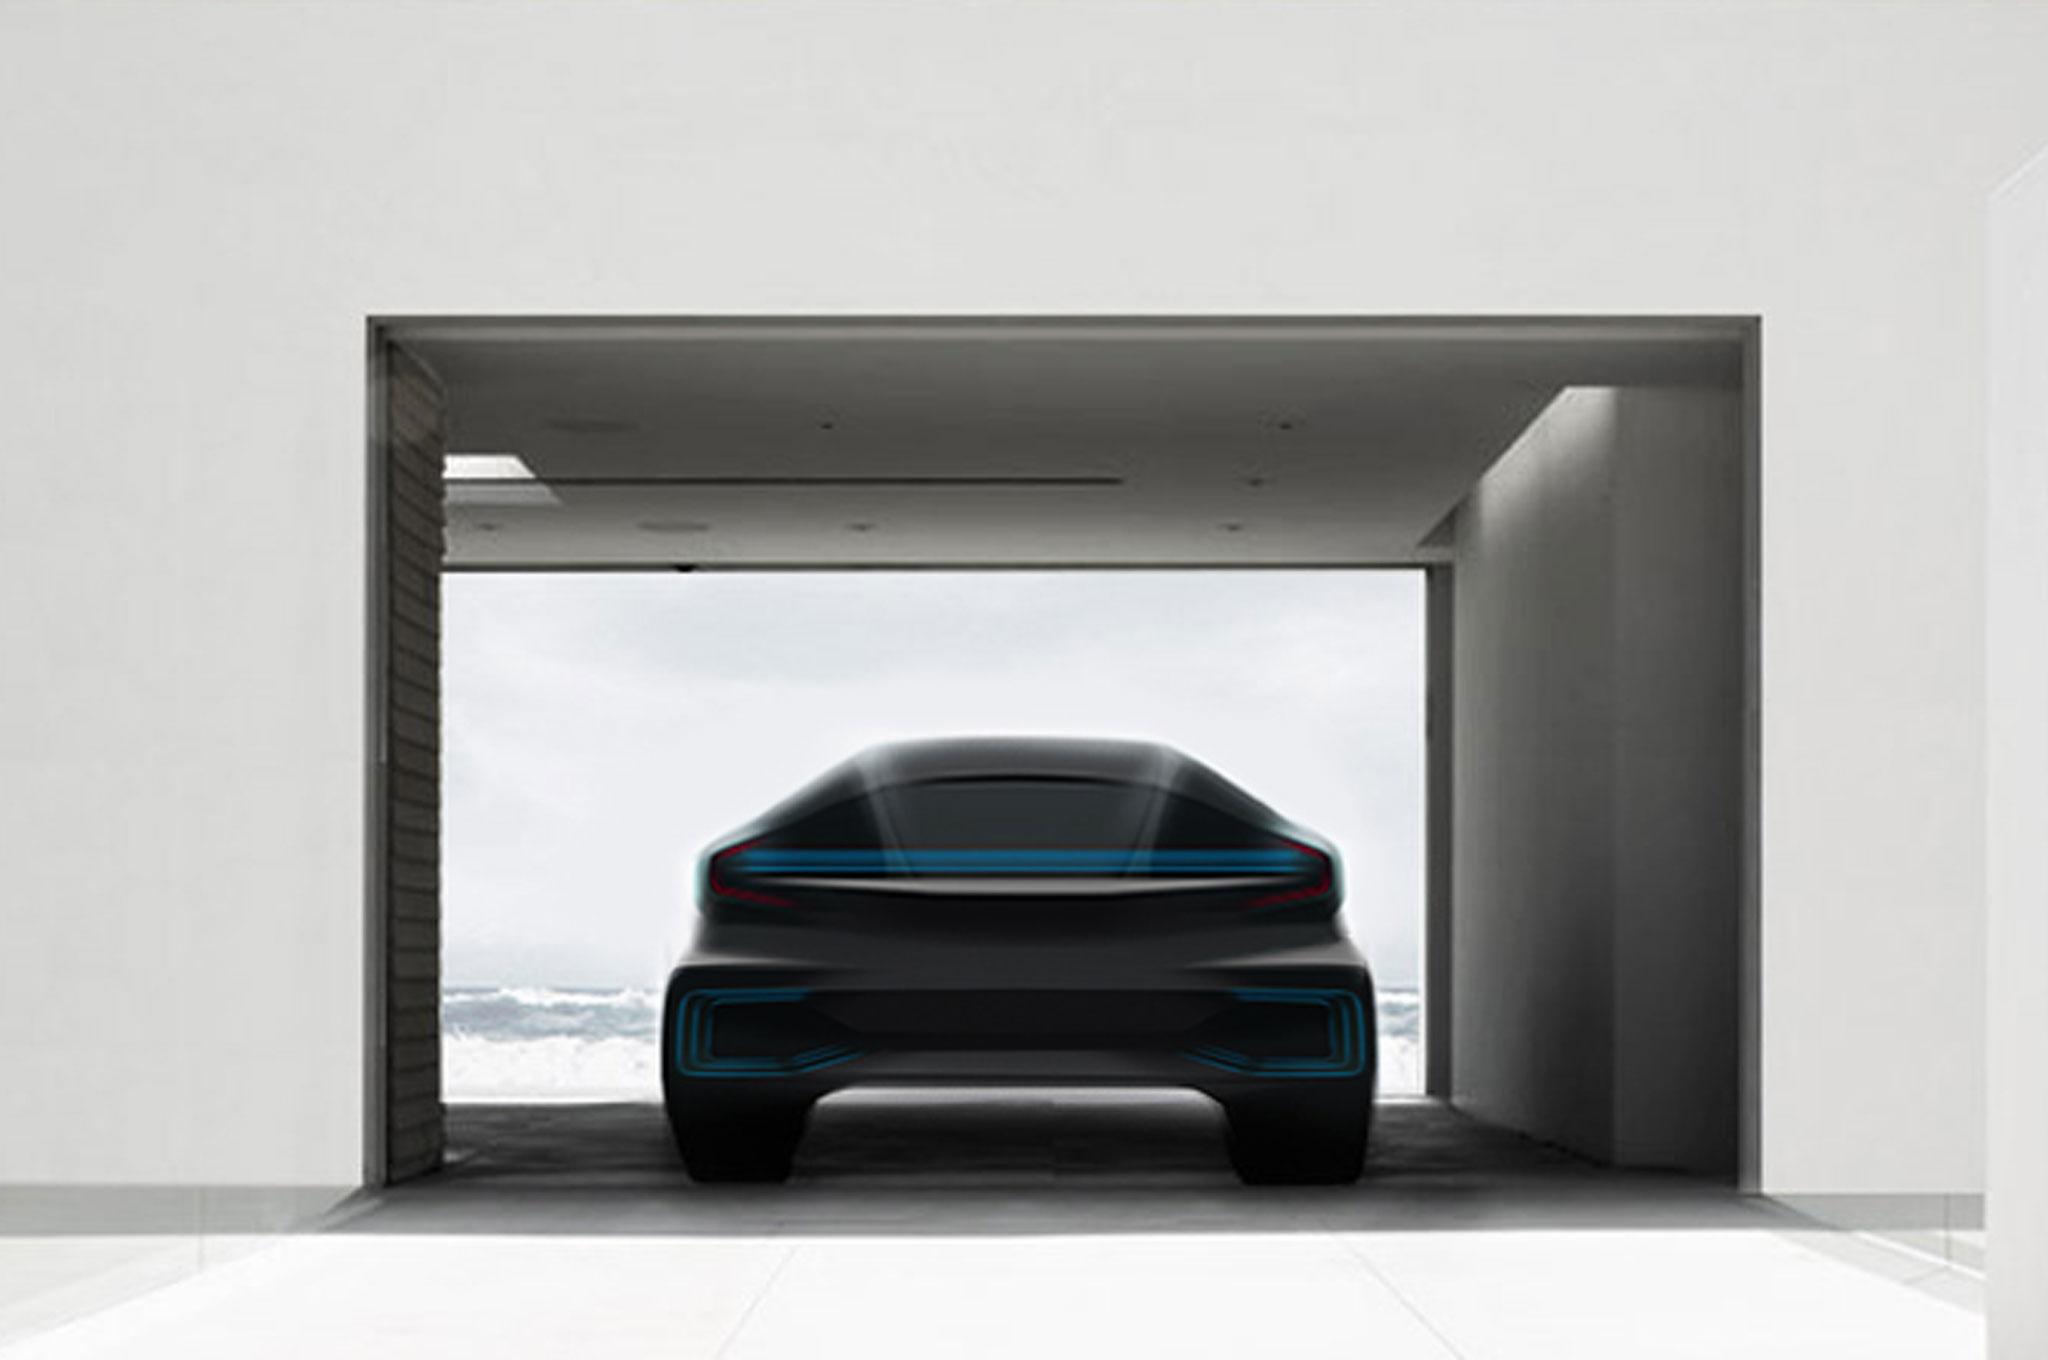 faraday future rear view teaser